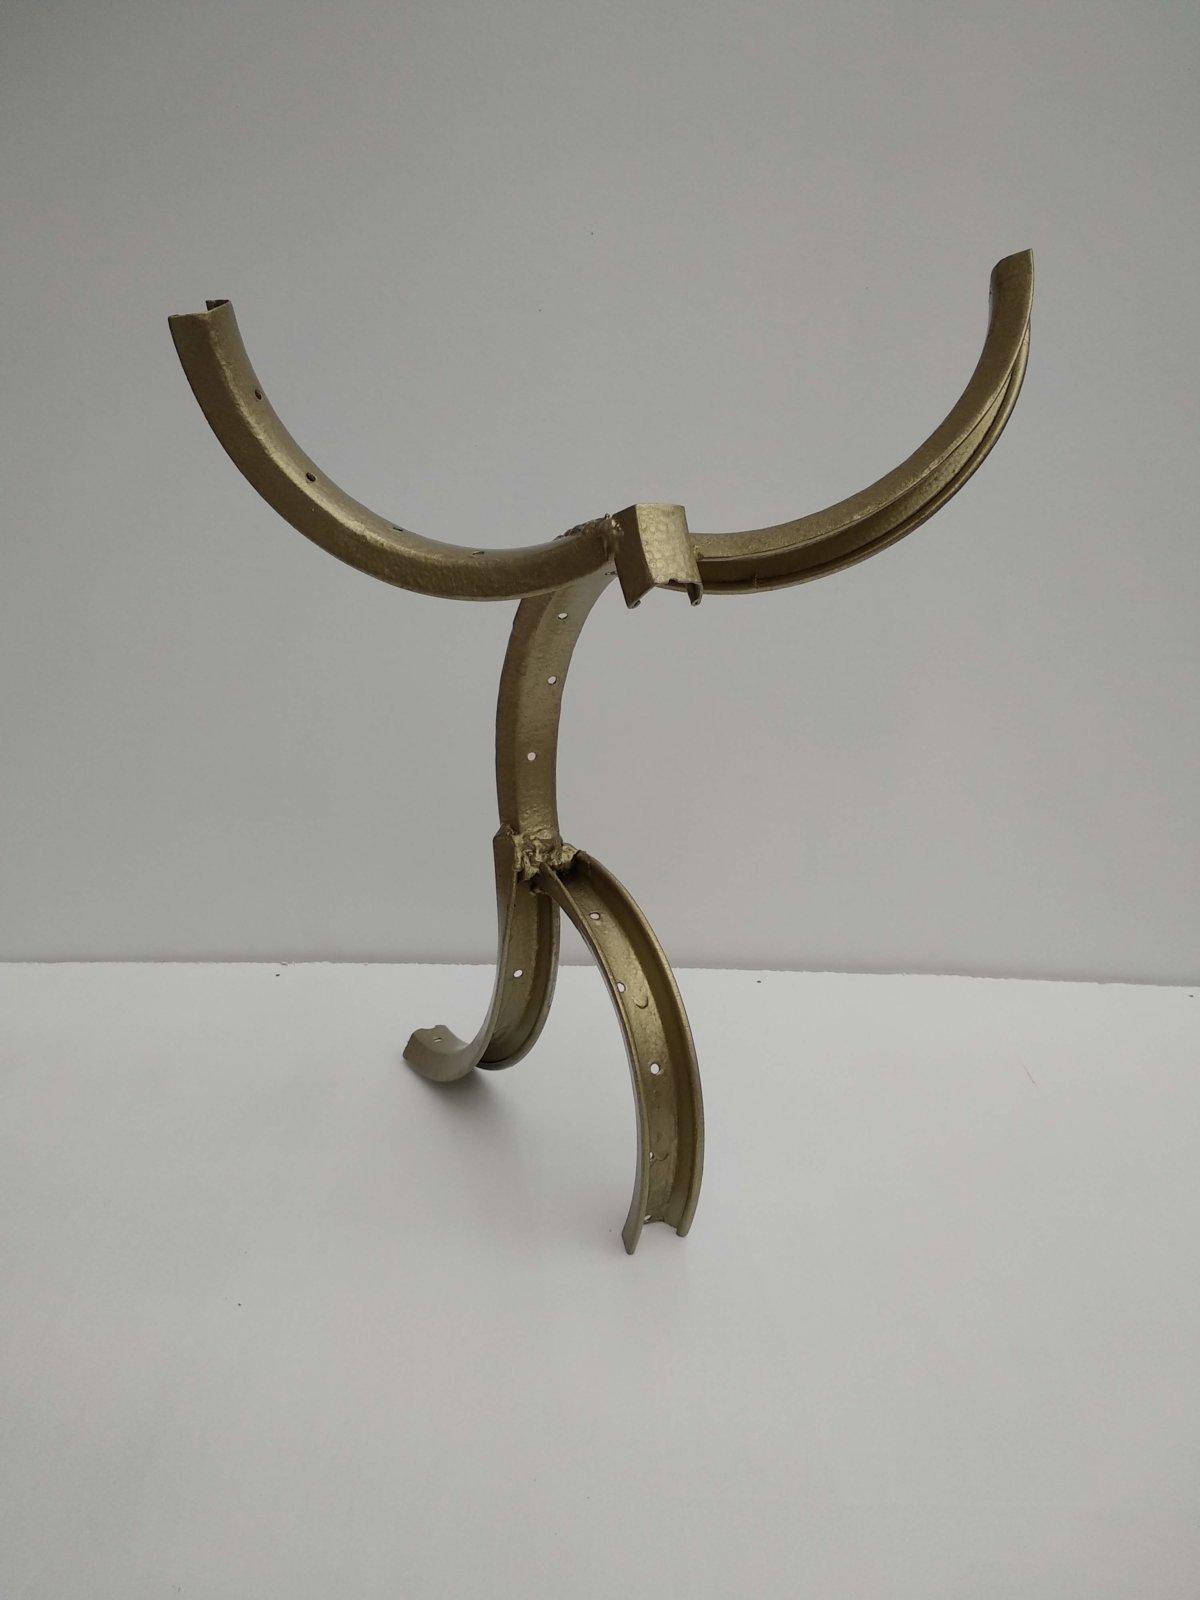 Sculpture Released Form A Circle Bicycle Art Primoz Roglic Telemark Decreatievelink